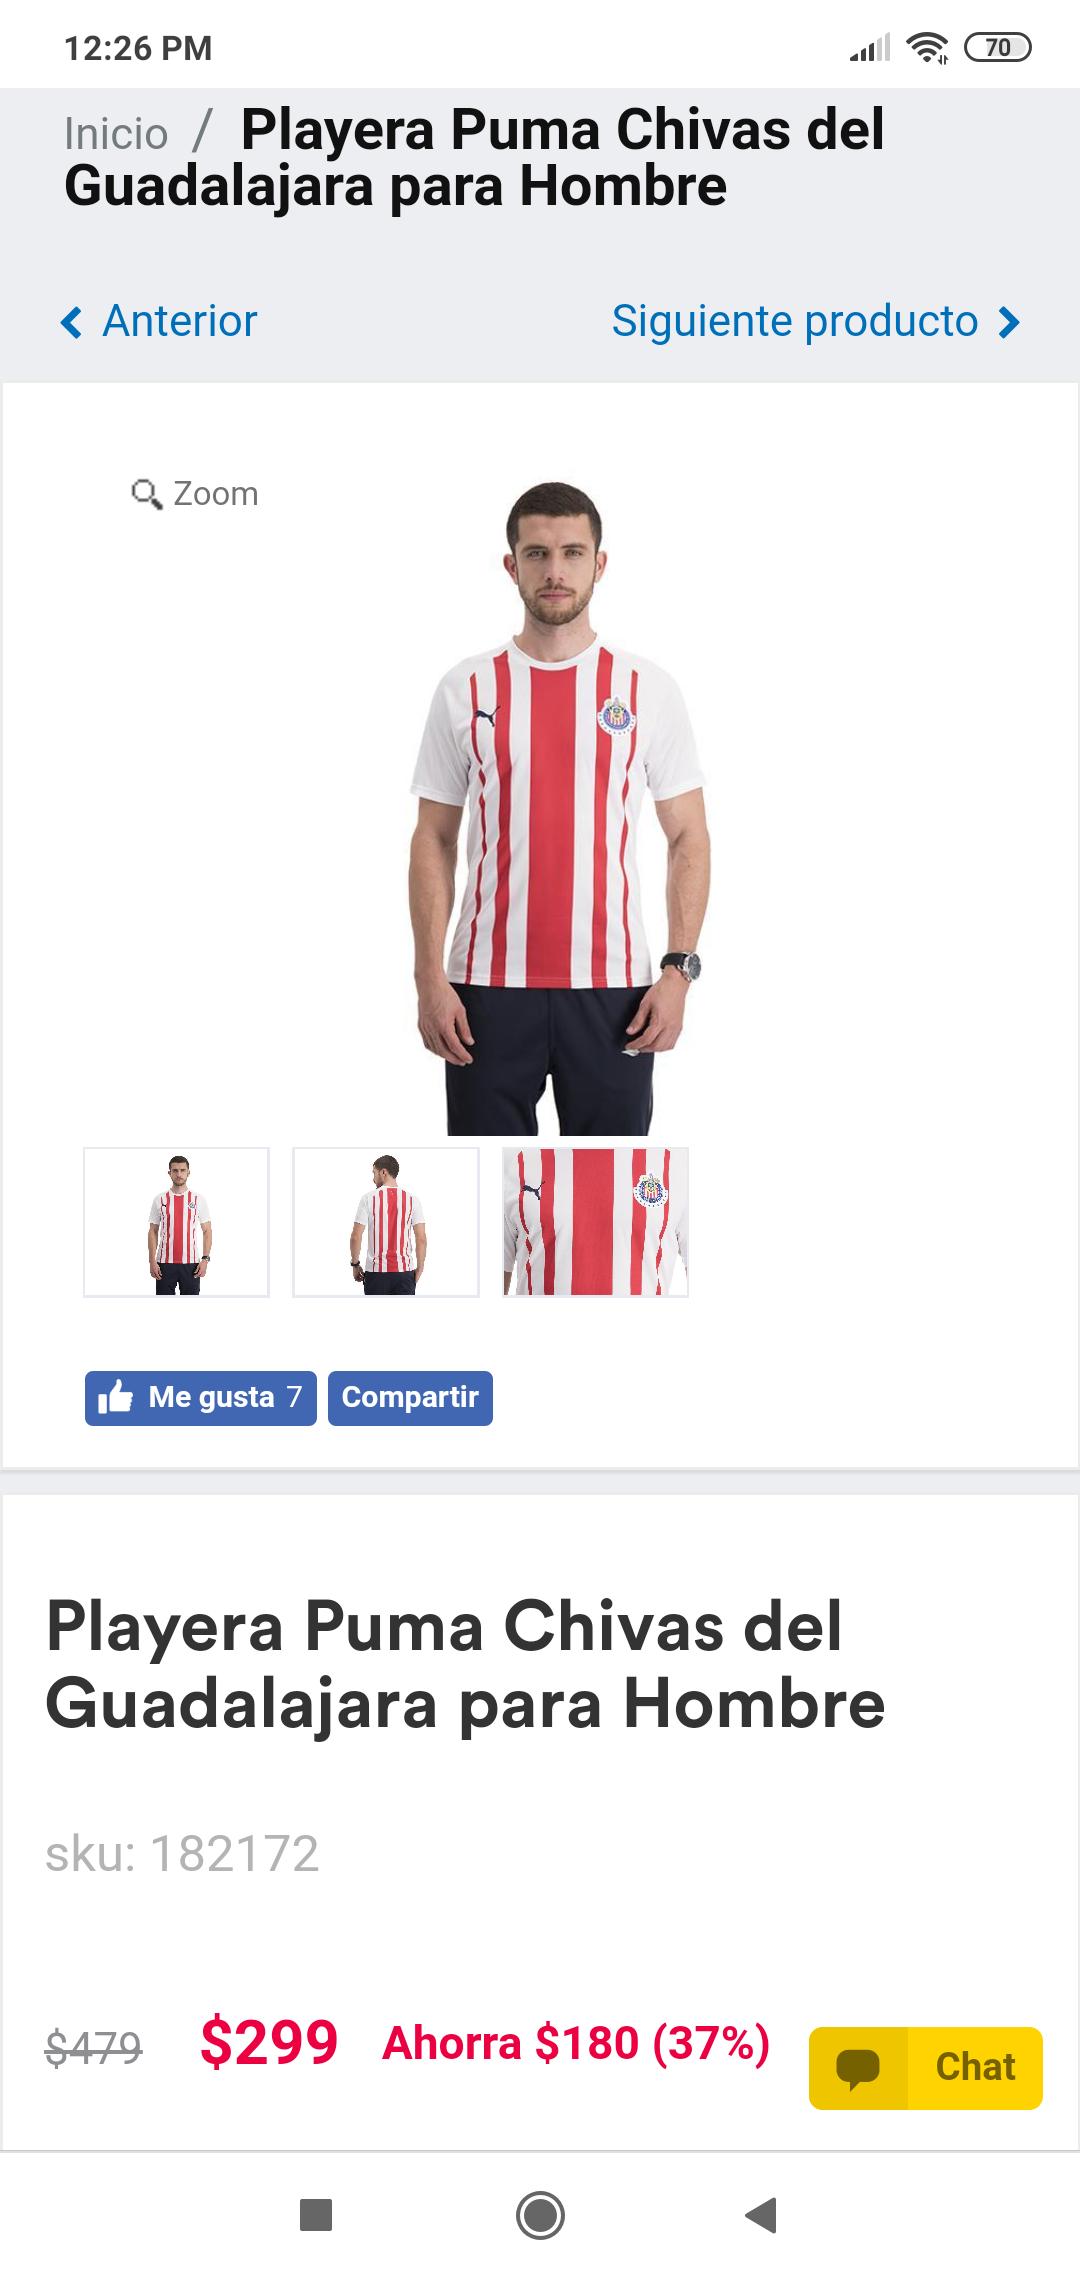 Coppel en linea: Playera Puma Chivas del Guadalajara para Hombre